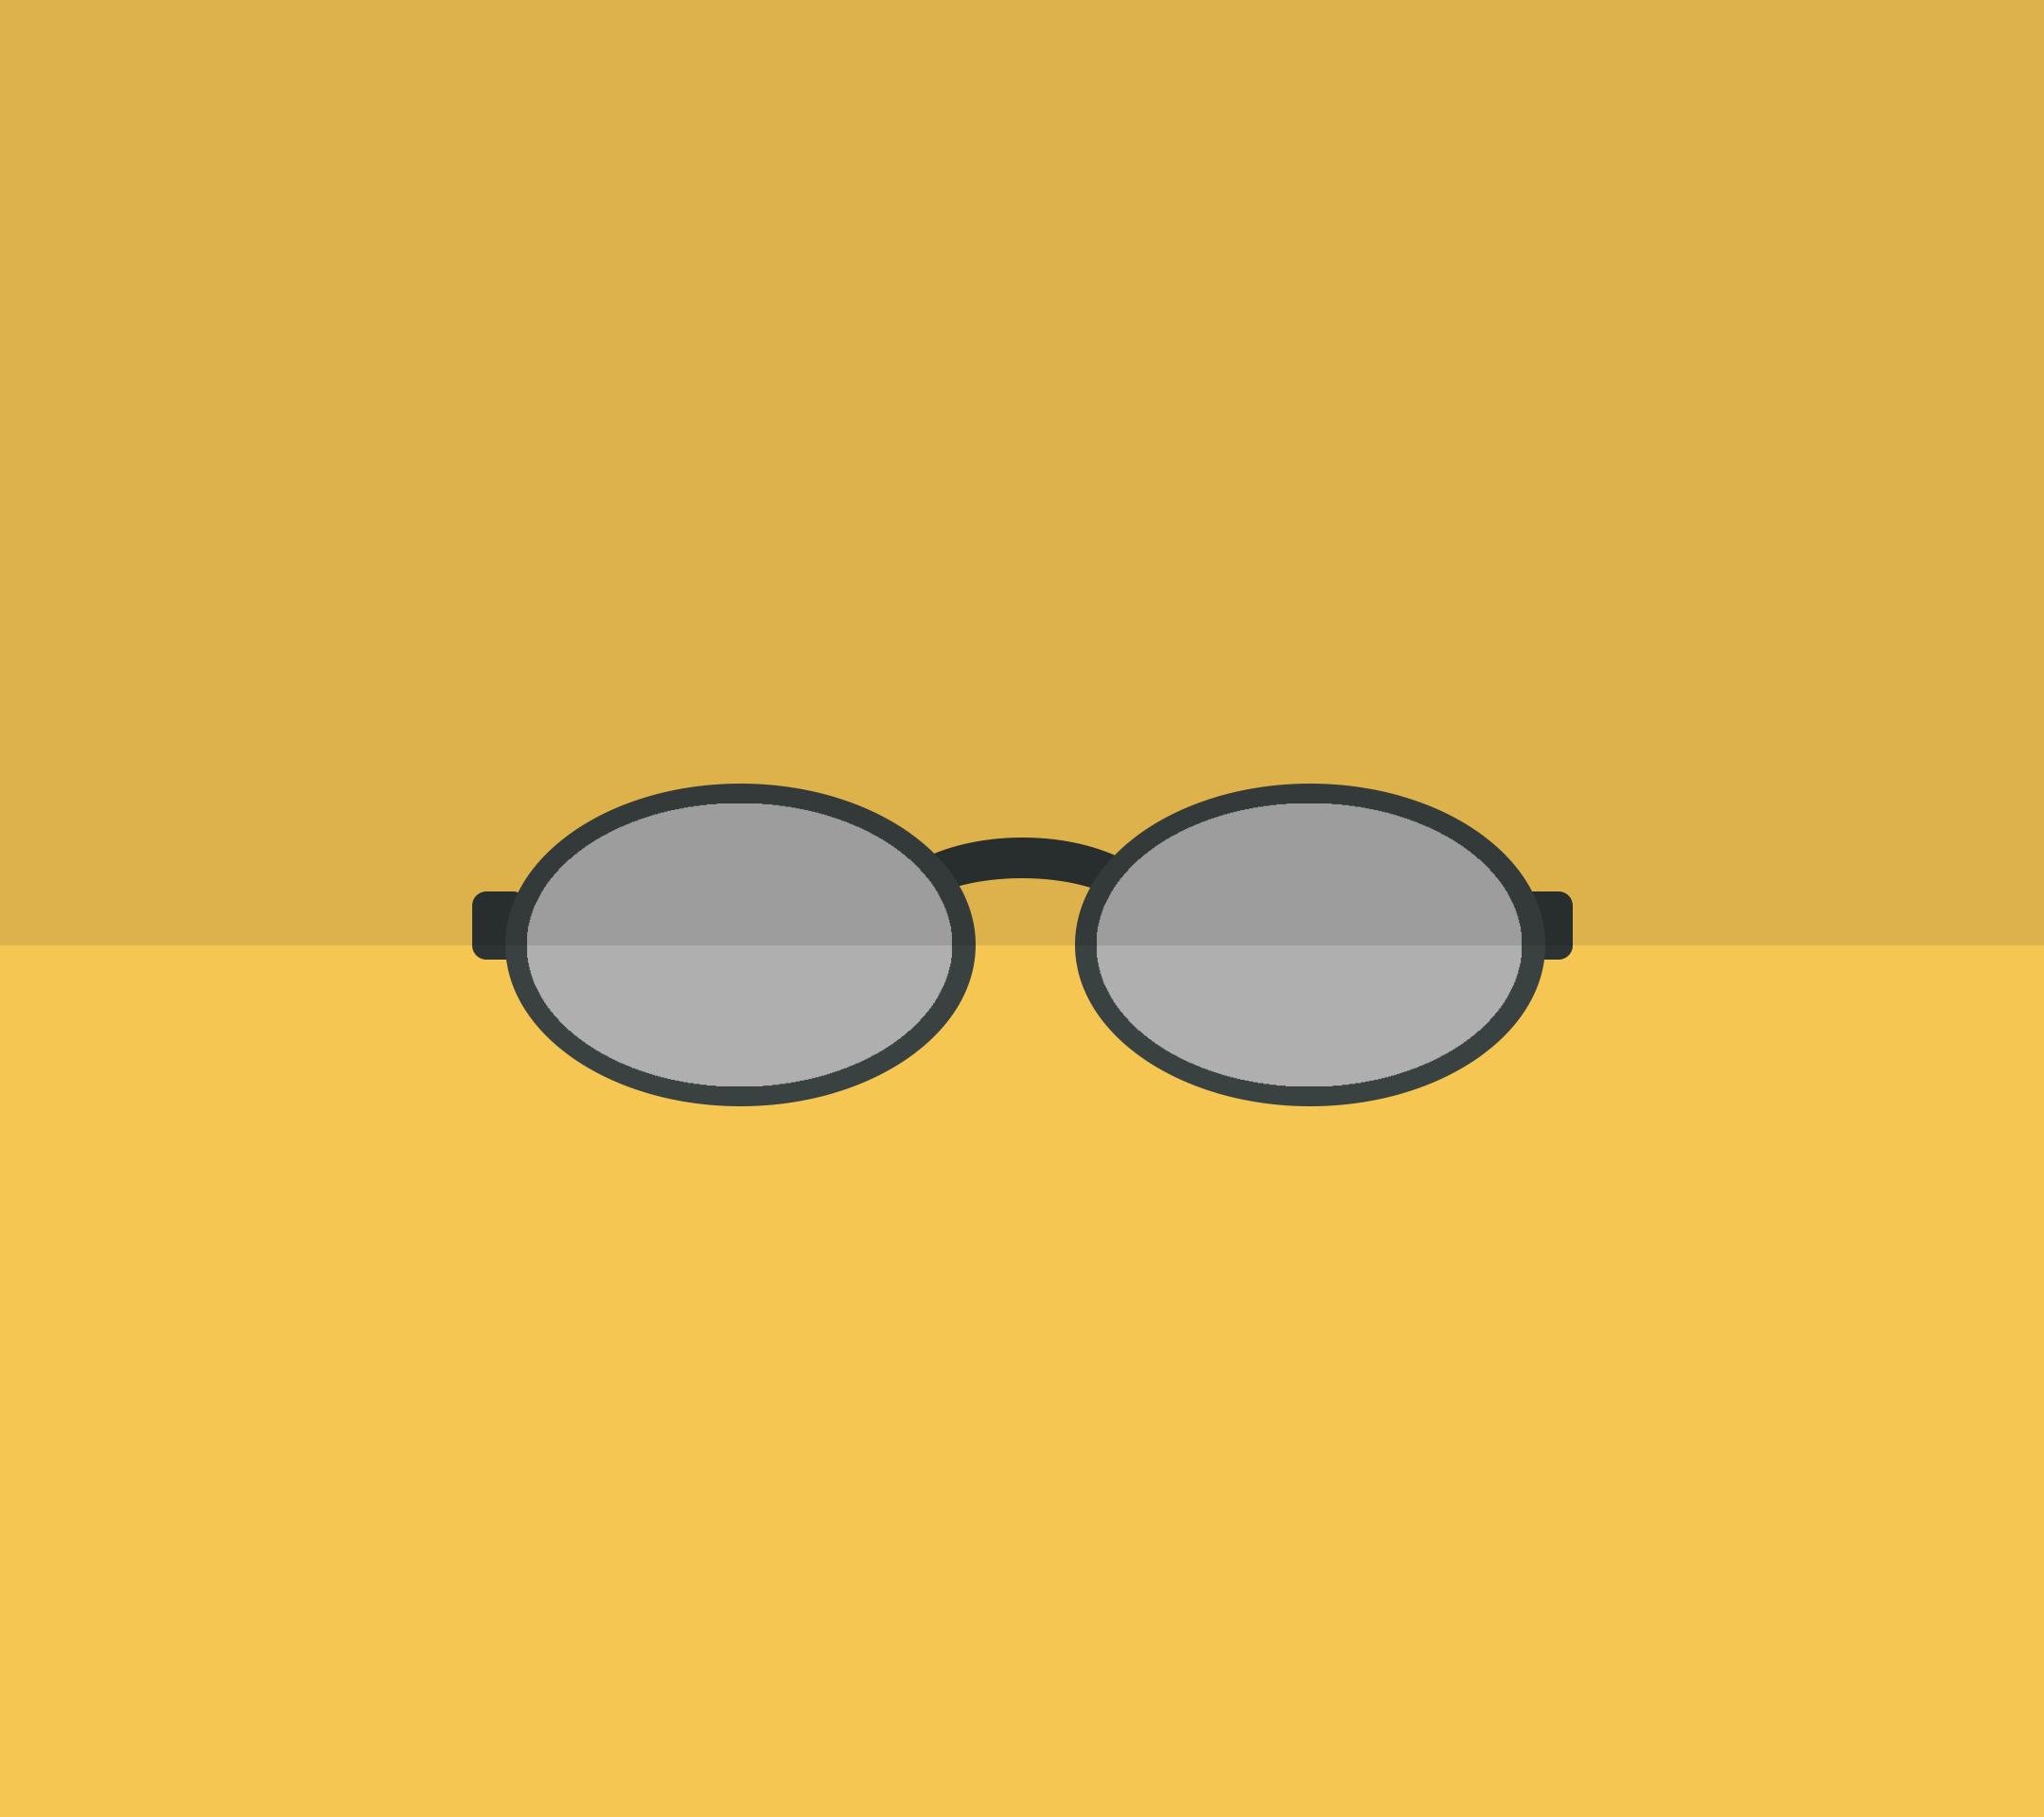 Sonnenbrille, Sonne, Kristalle, Gelb, Brillen - Wallpaper HD - Prof.-falken.com